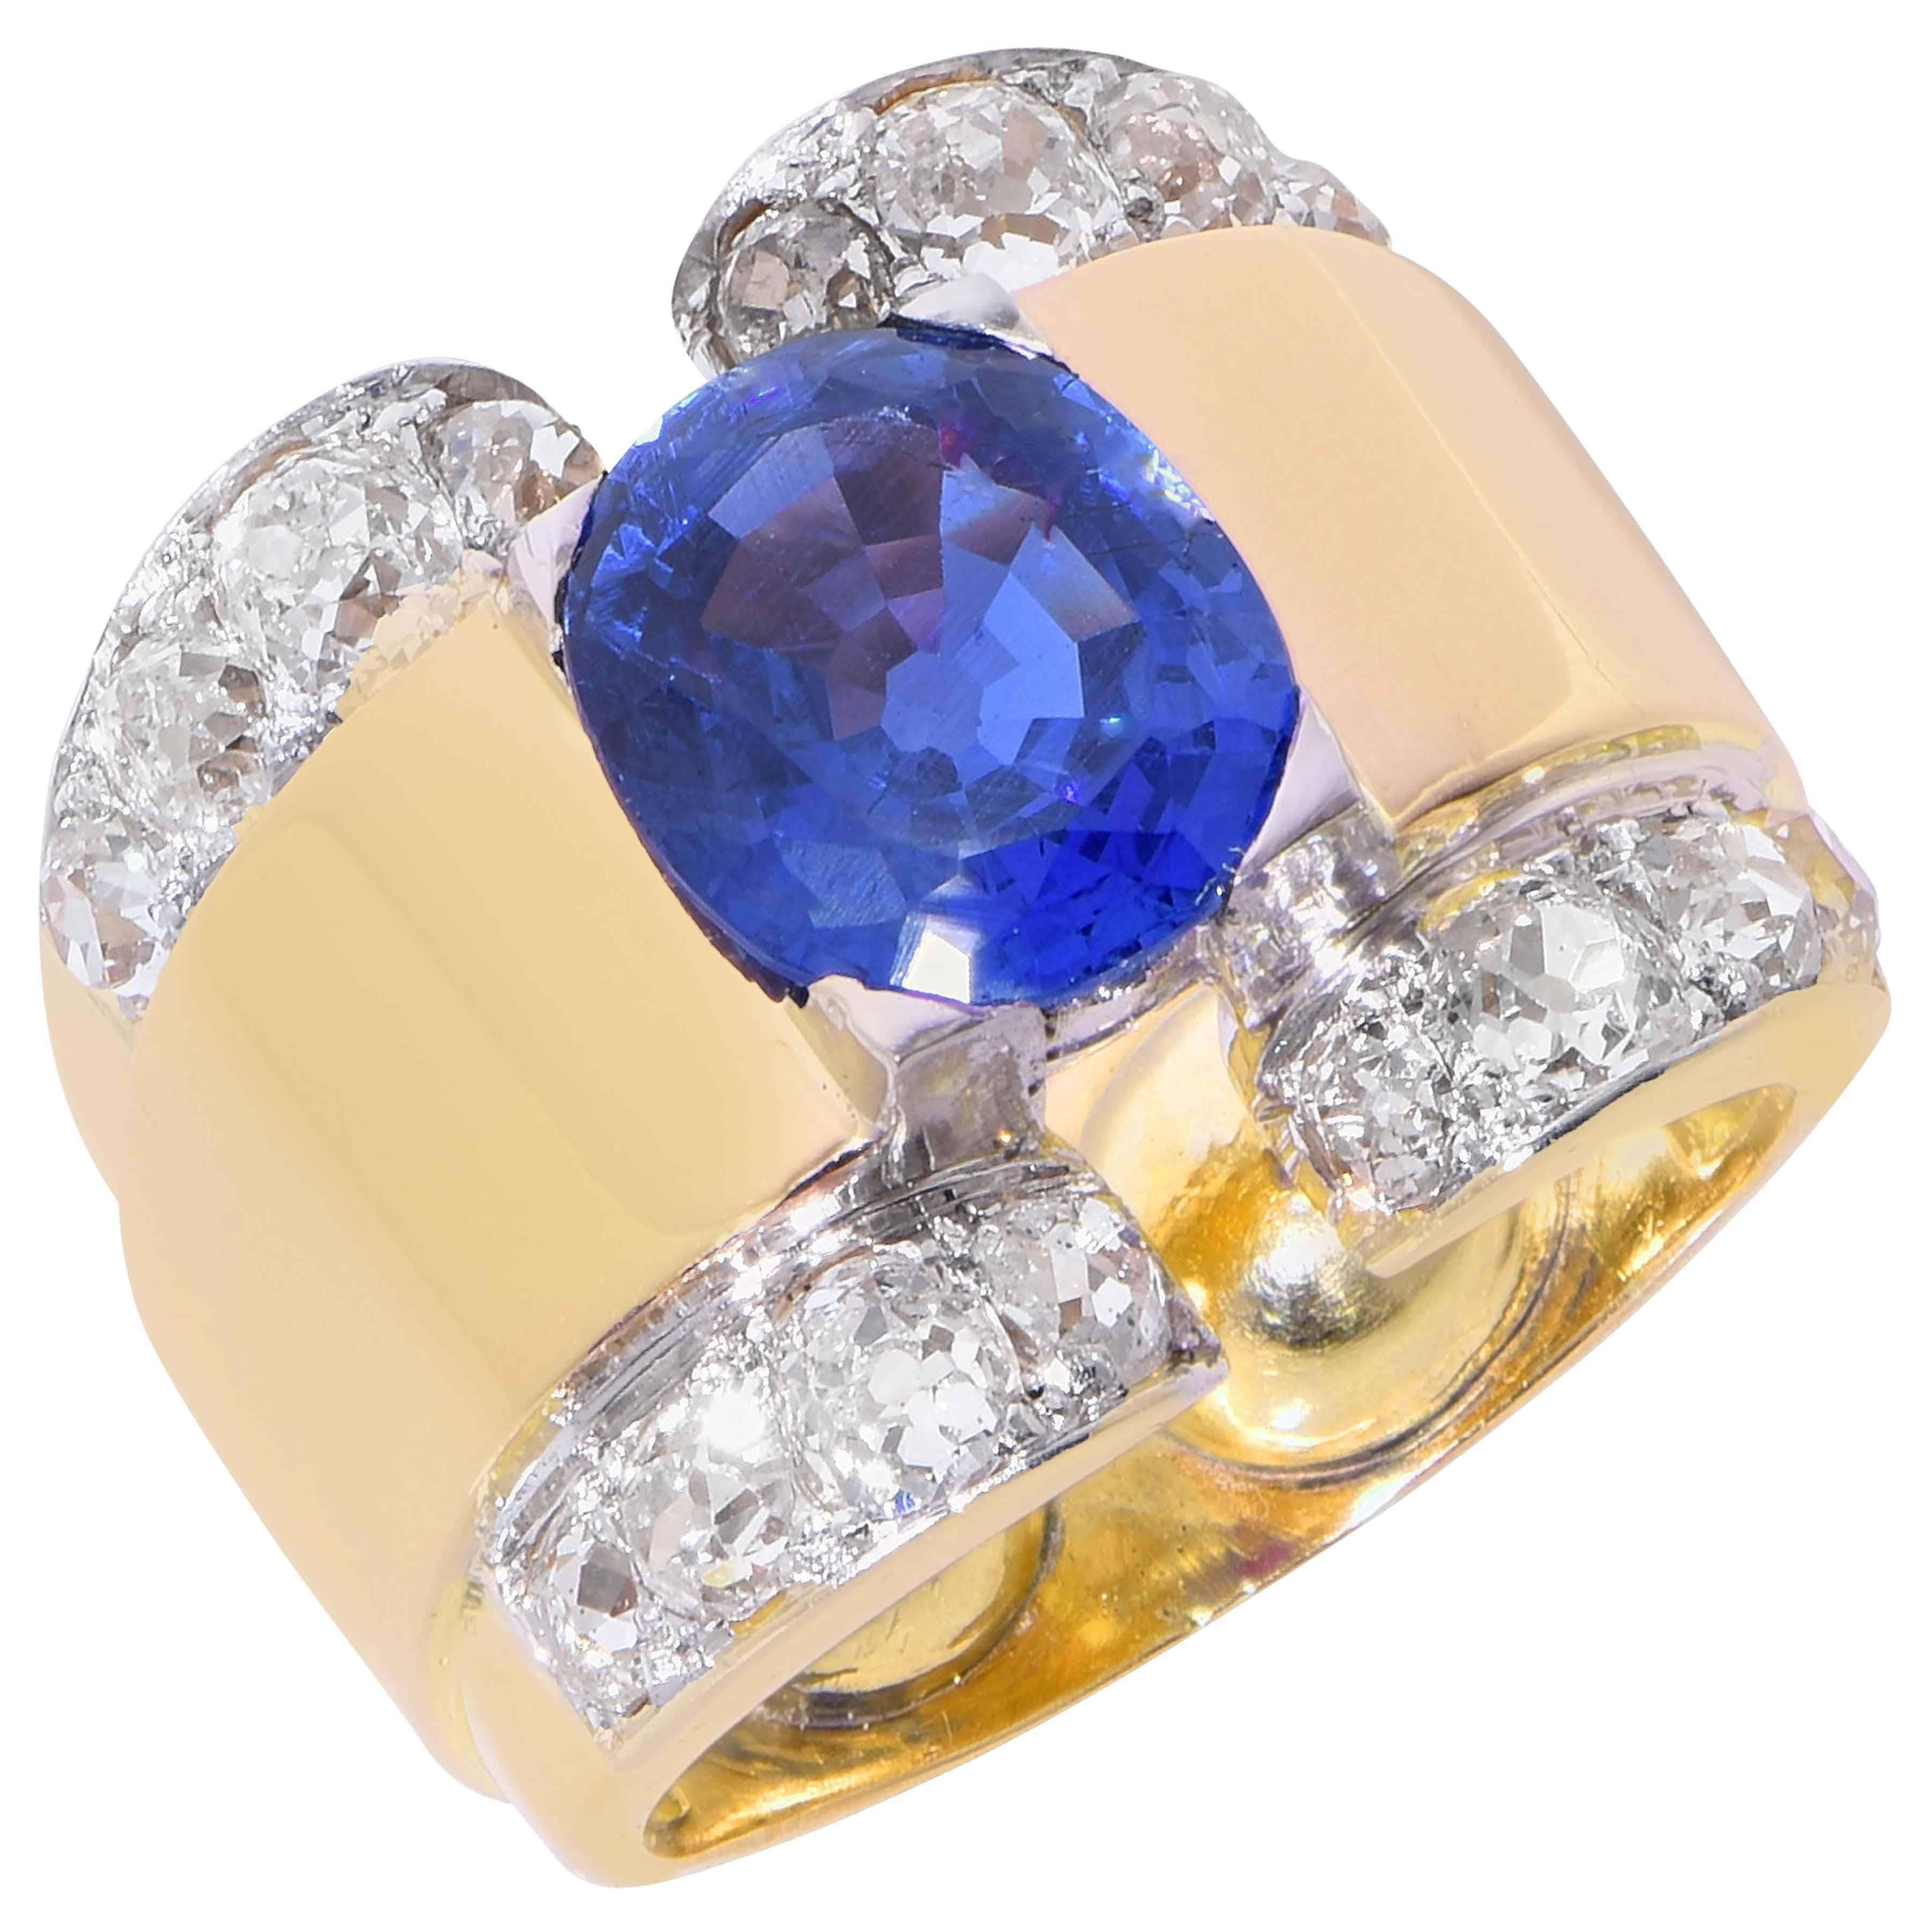 6 Carat GIA Graded Ceylon No Heat Sapphire and Diamond Retro Gold Ring